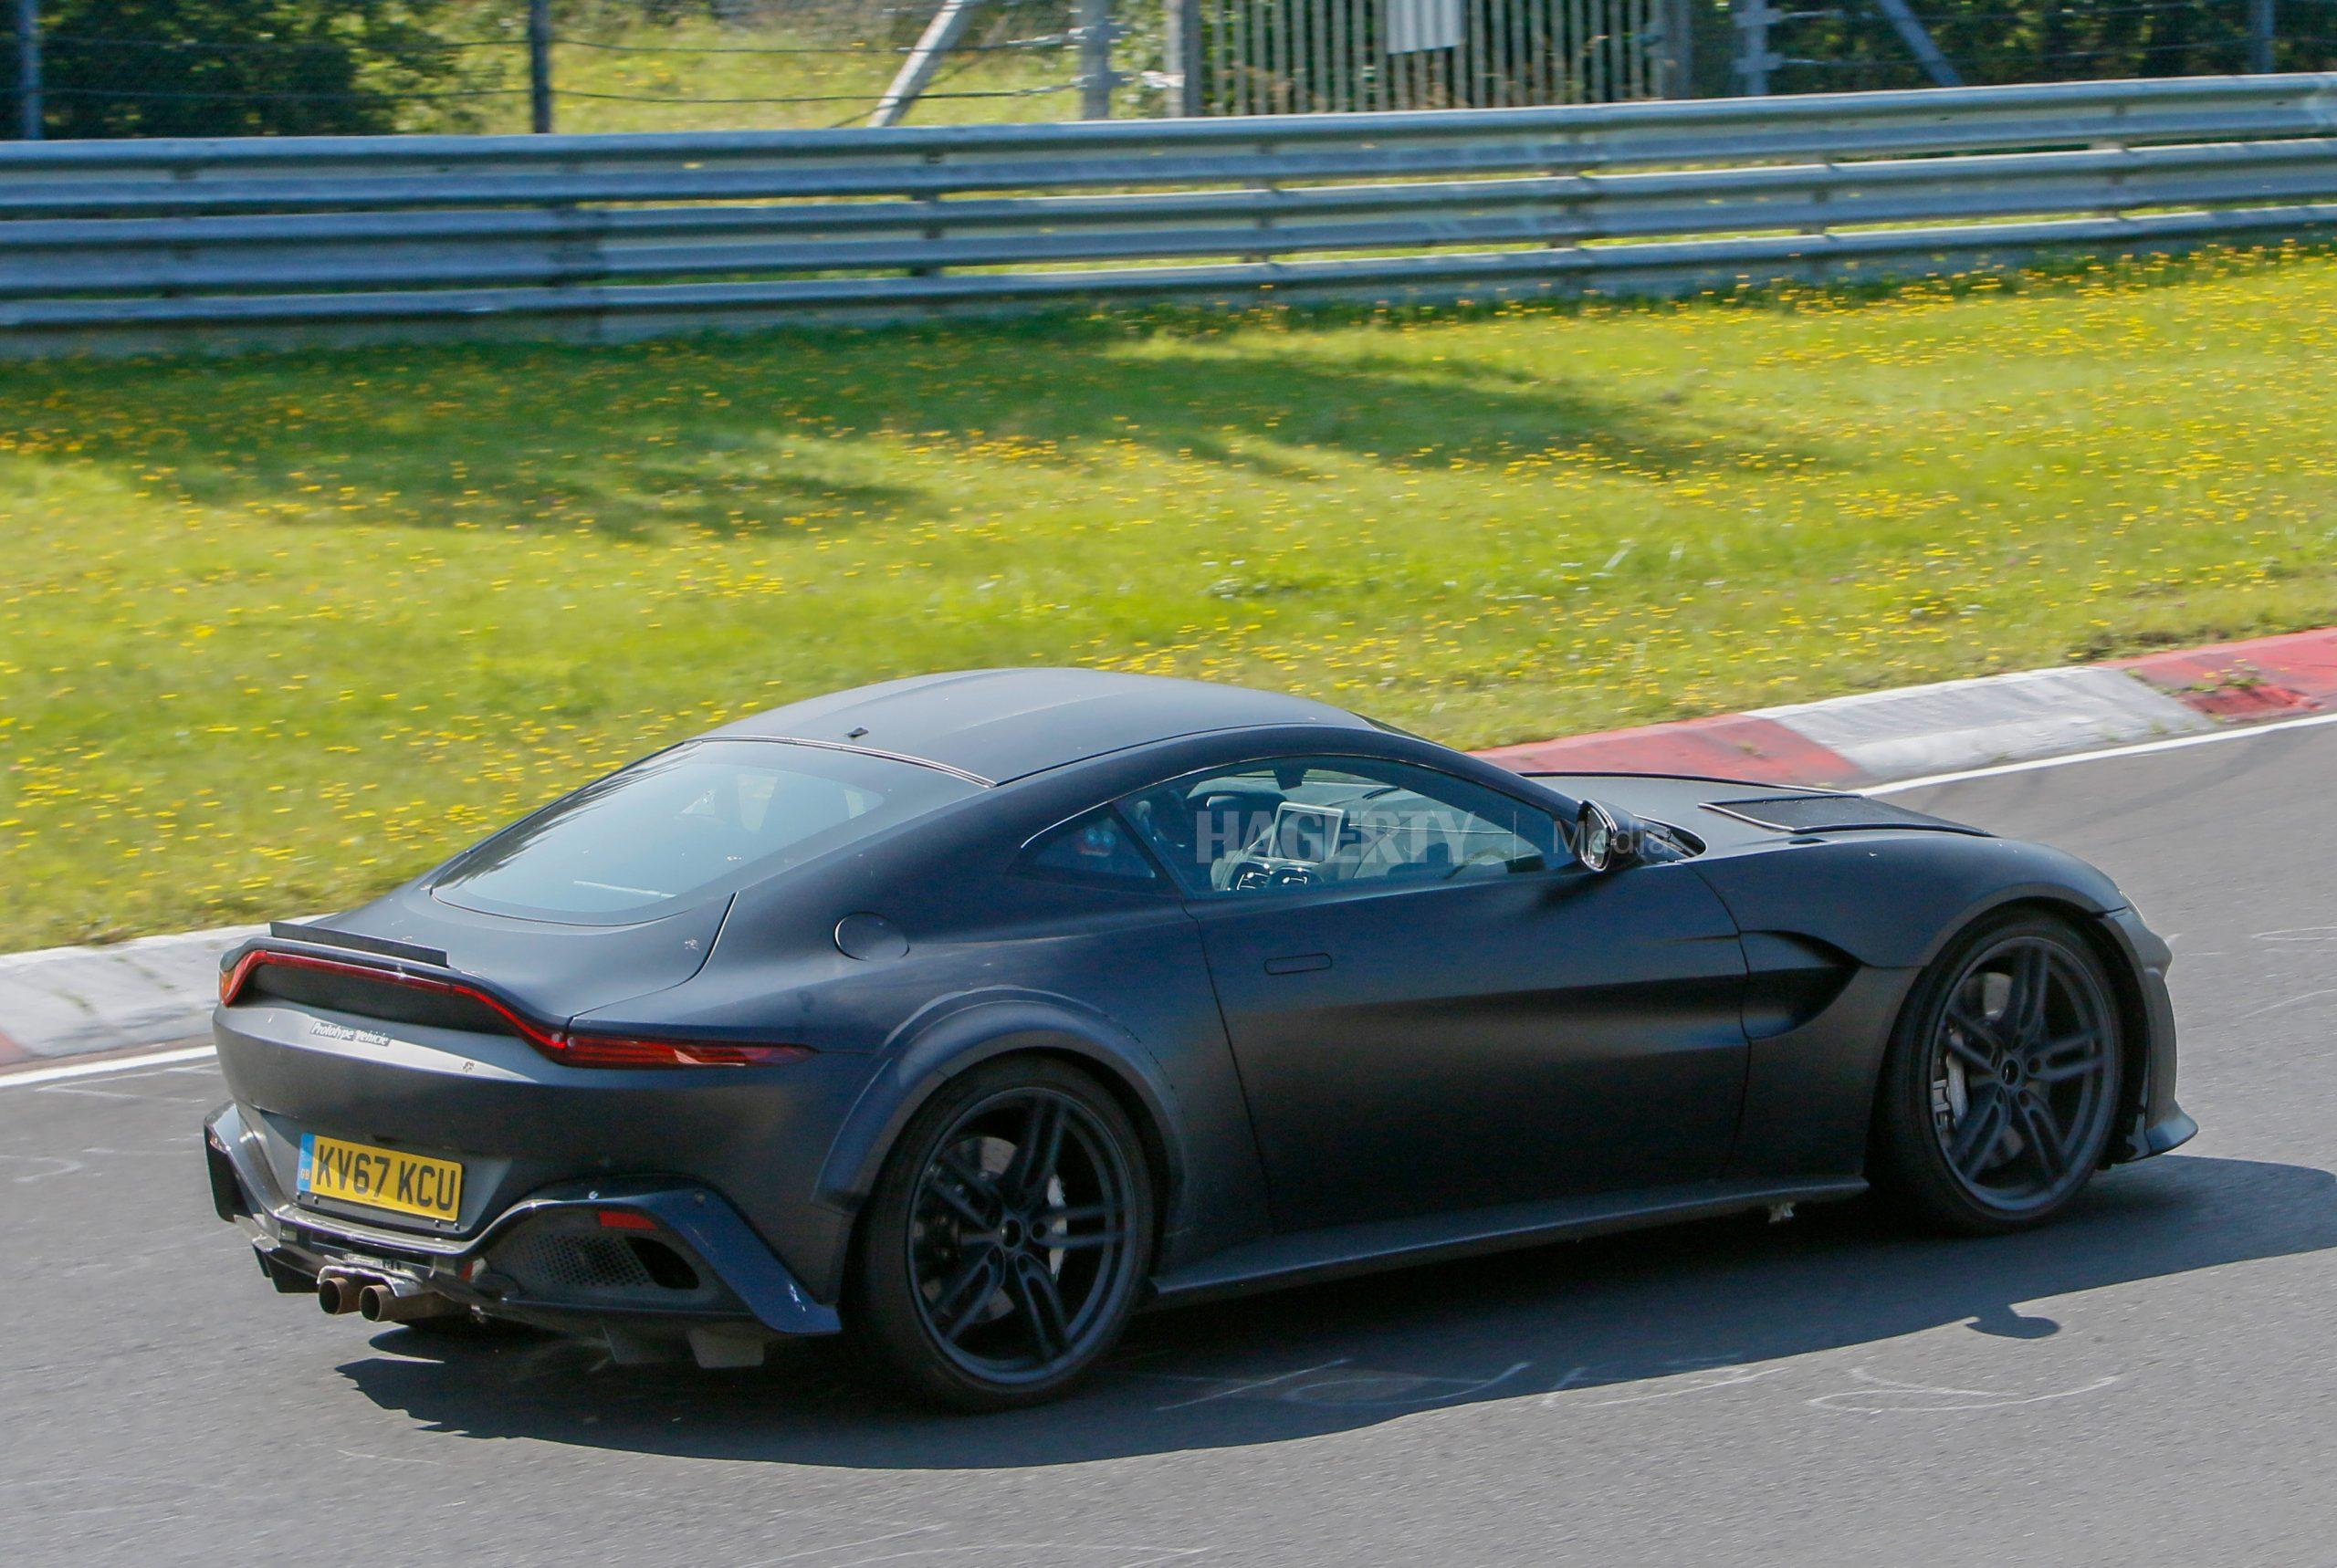 Aston Martin Vantage mule spy shot rear three-quarter